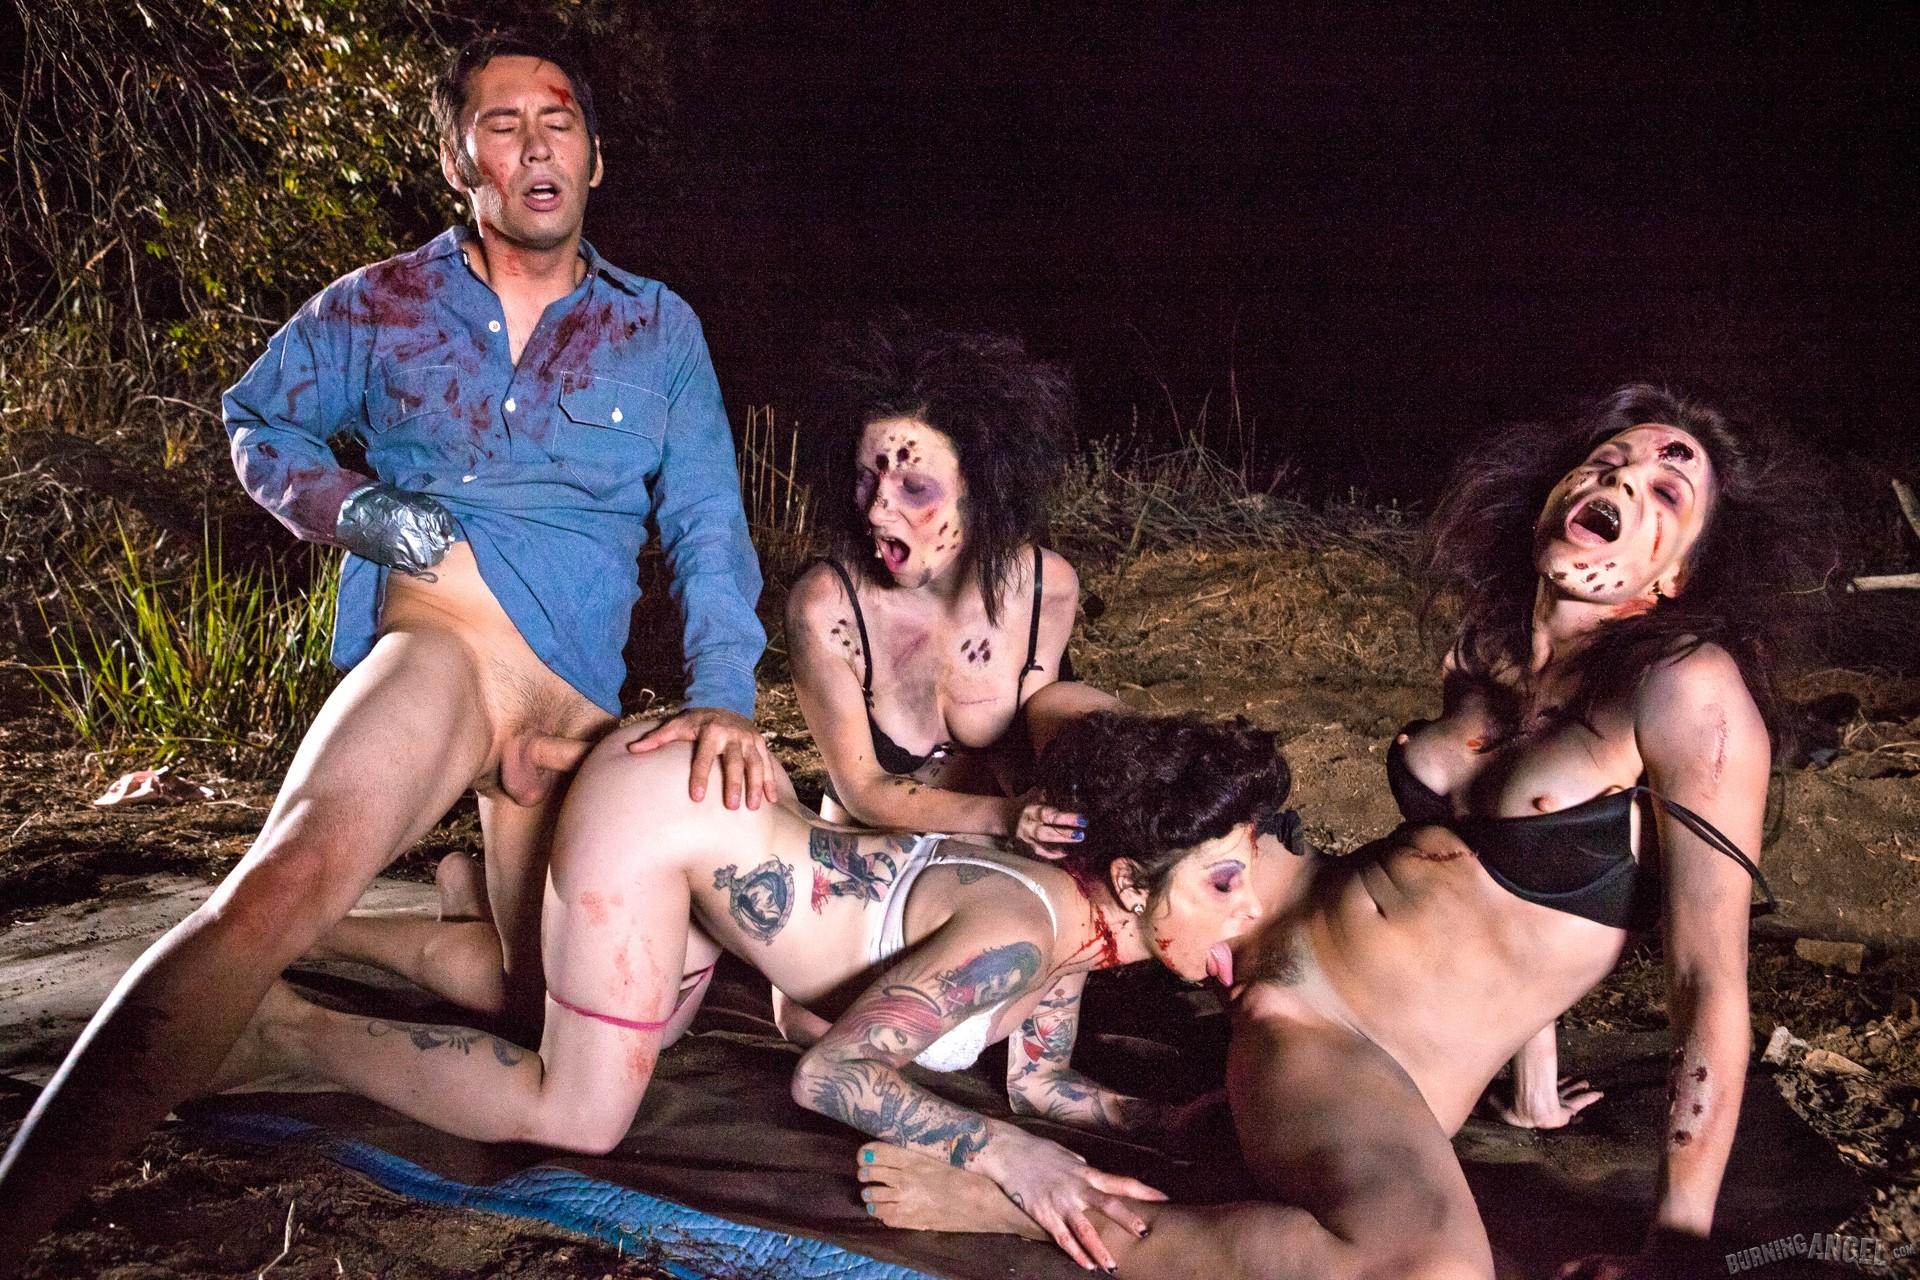 Evil dead parody porn naked girl